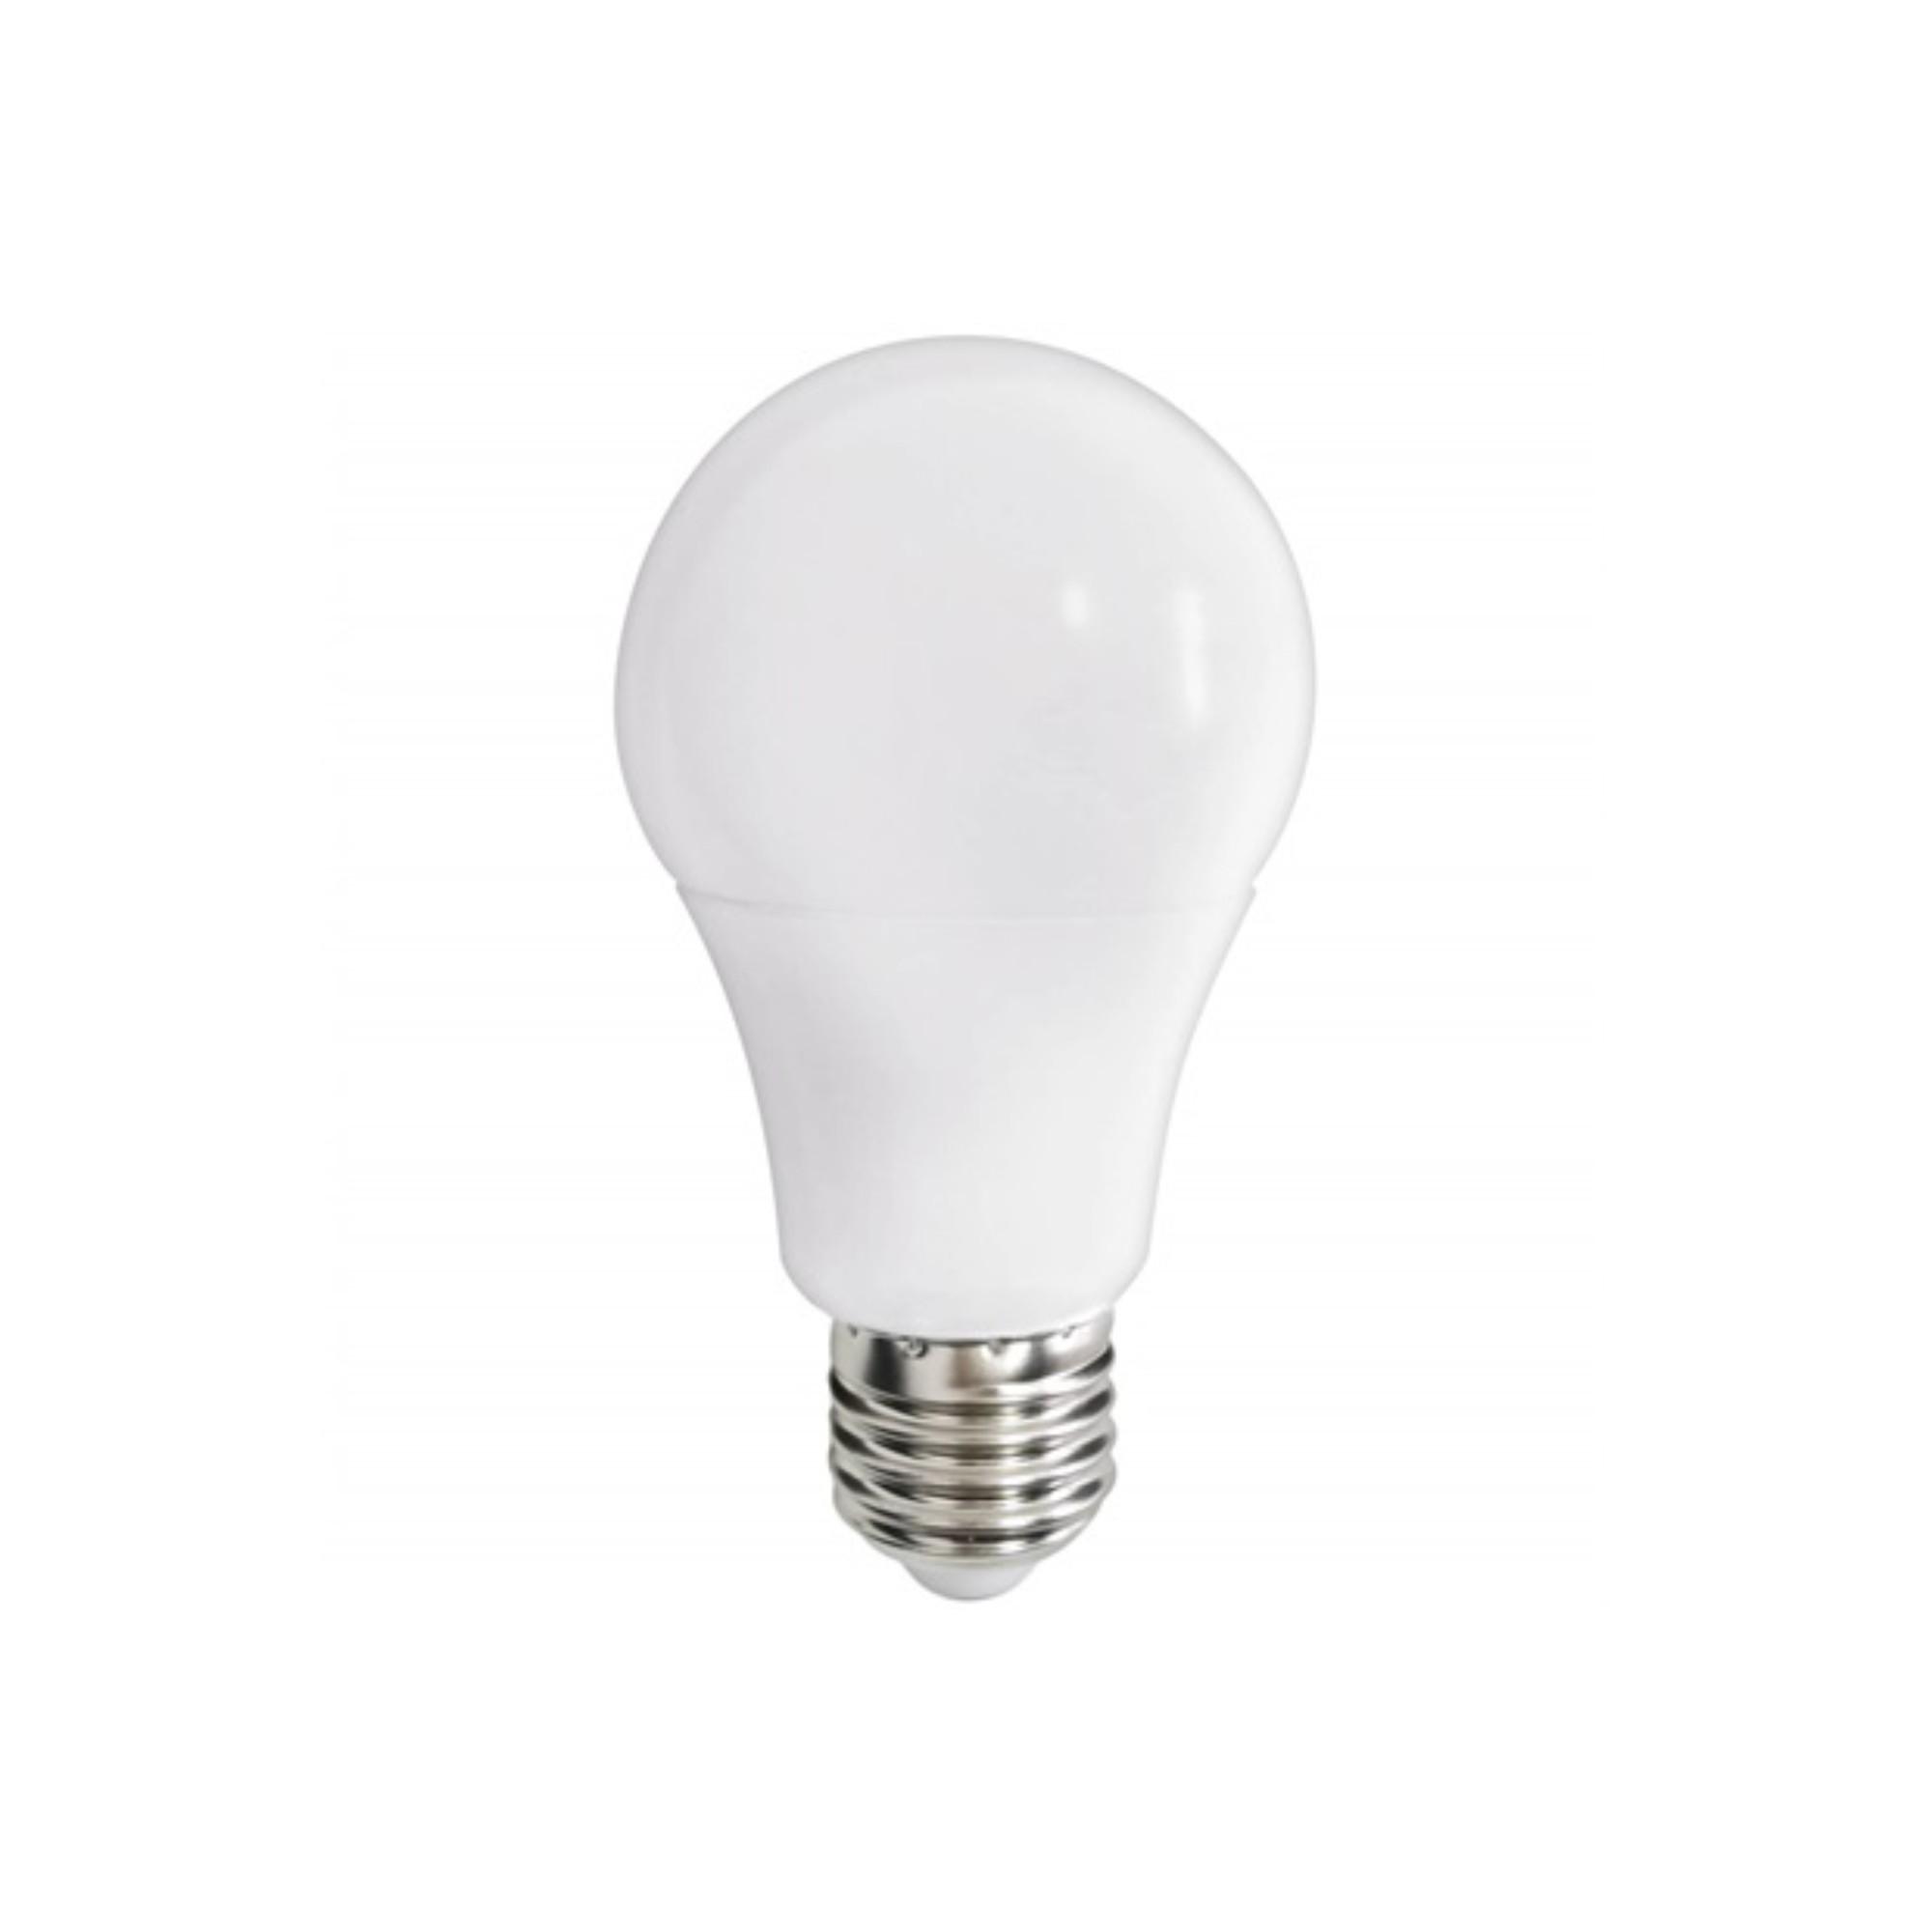 Lâmpada Led 12w Bulbo Soquete E27 Bivolt